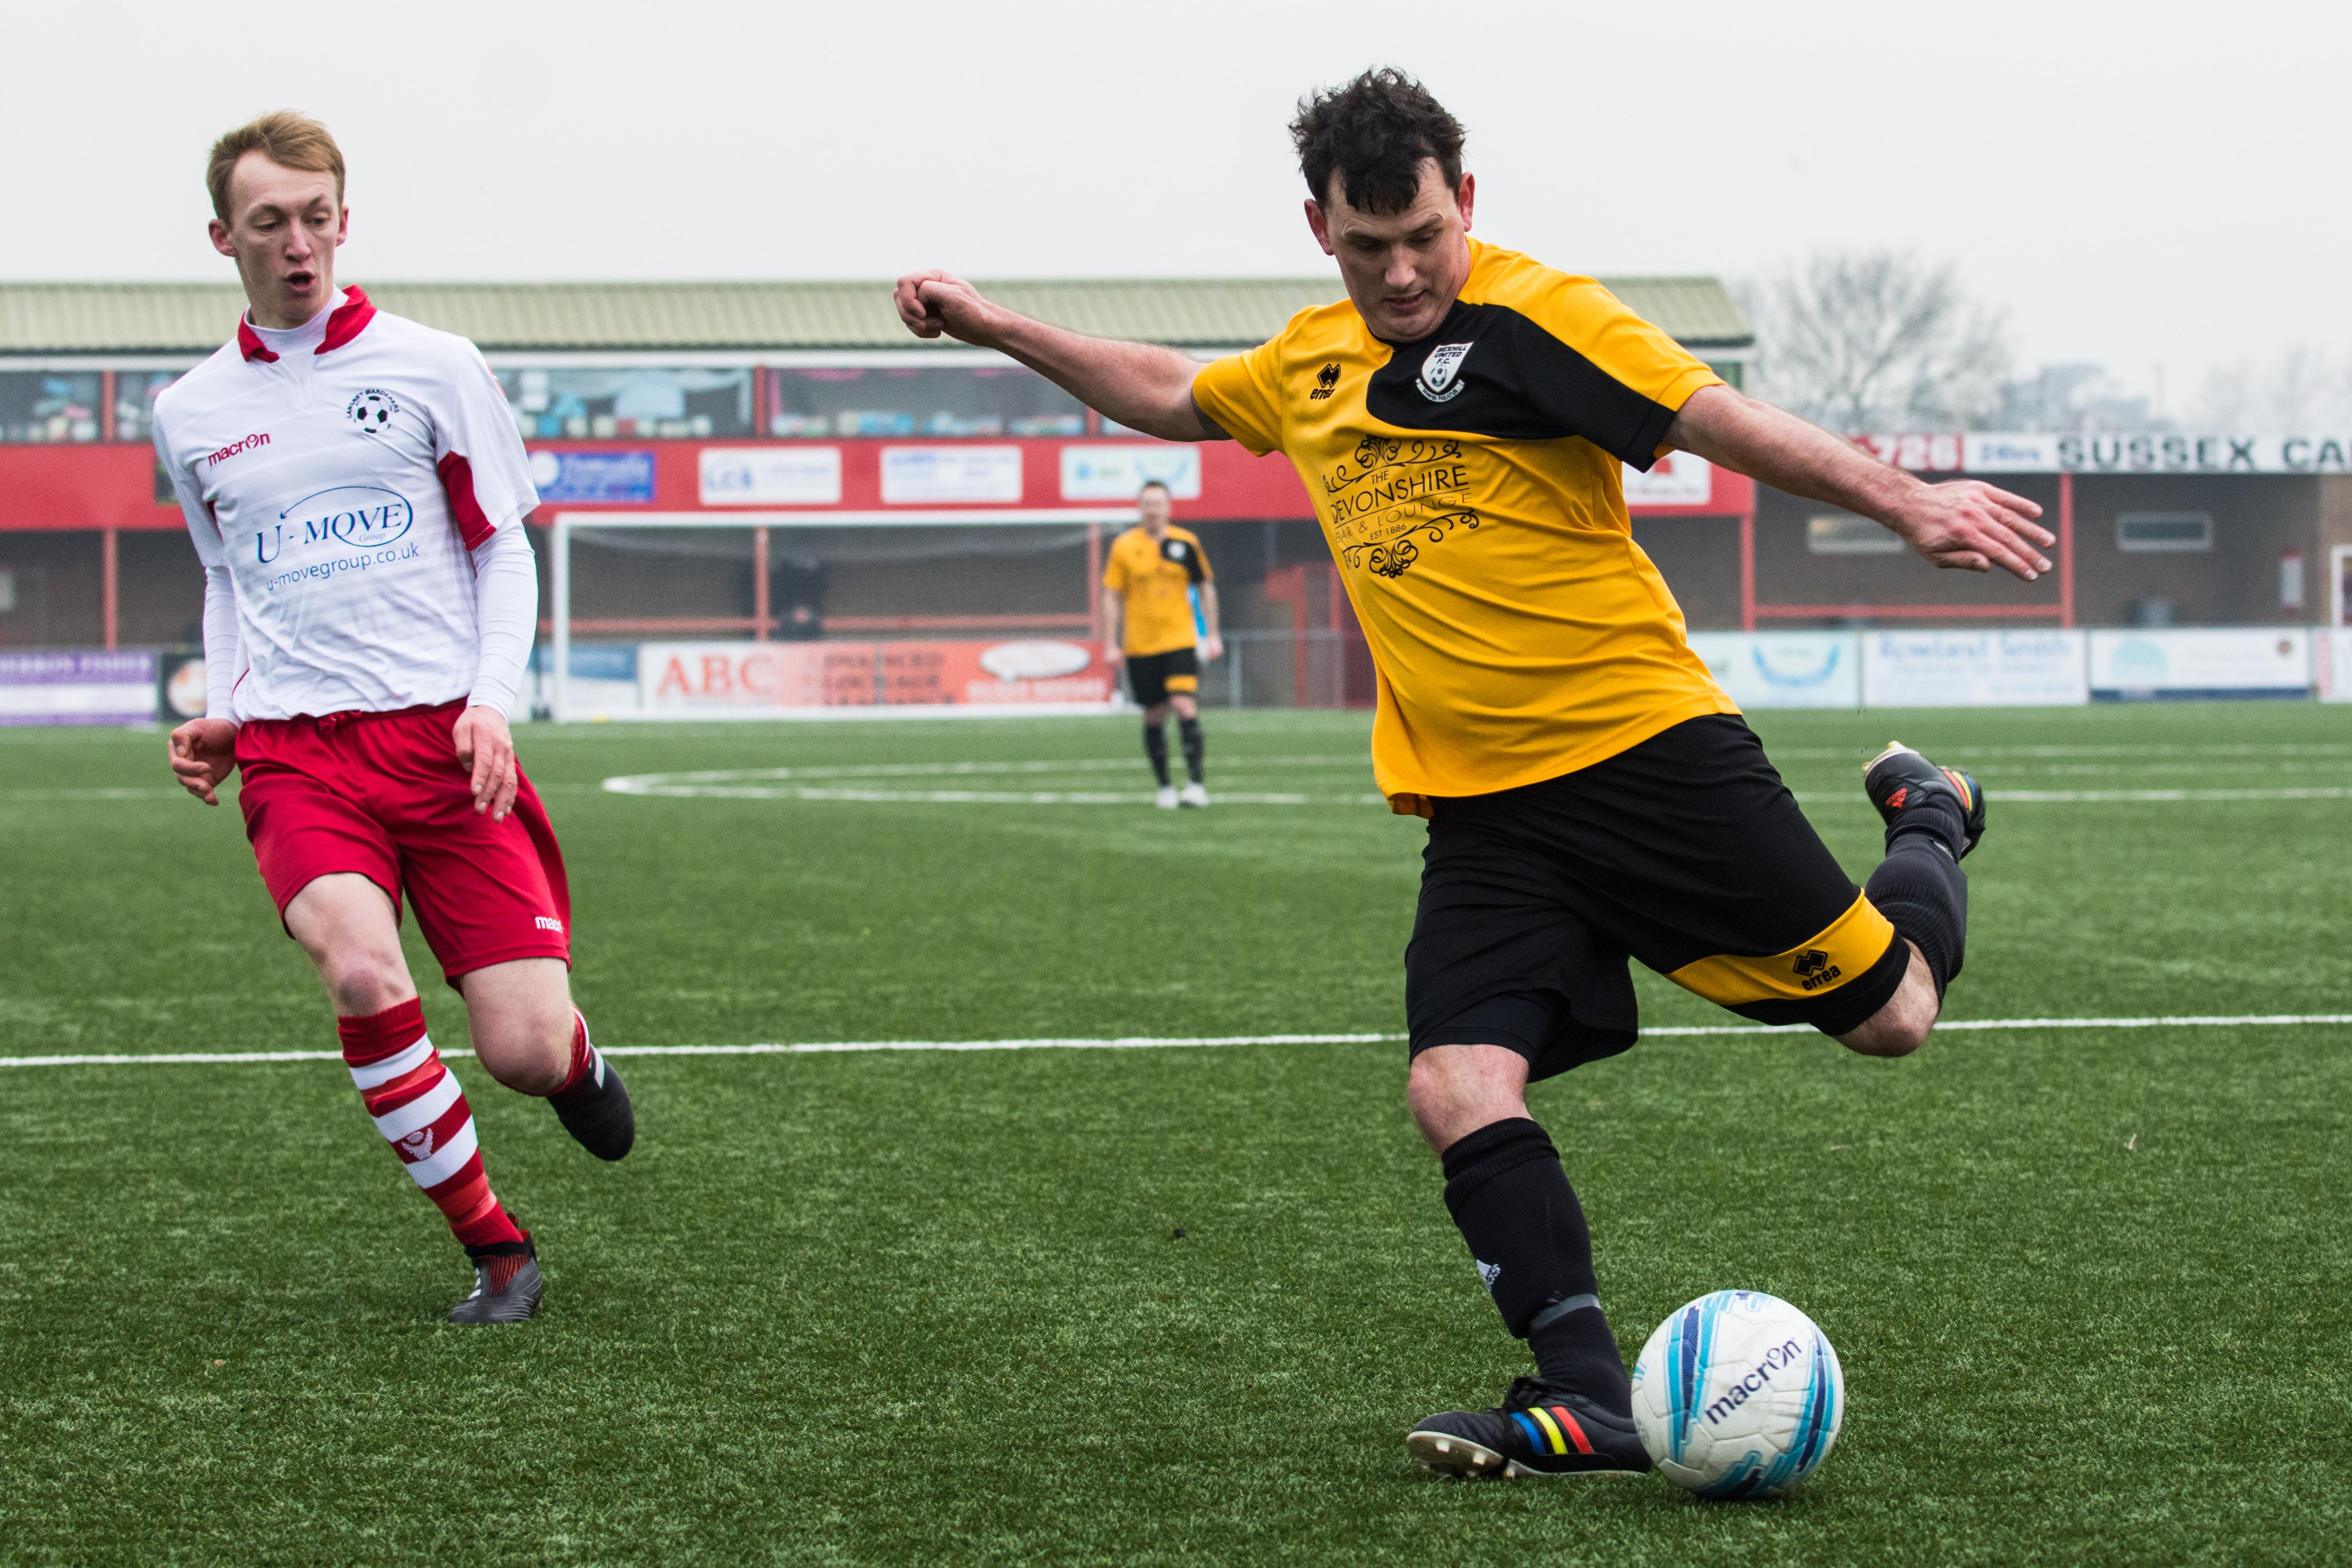 DAVID_JEFFERY Langney Wanderers FC vs Bexhill United FC 03.03.18 54